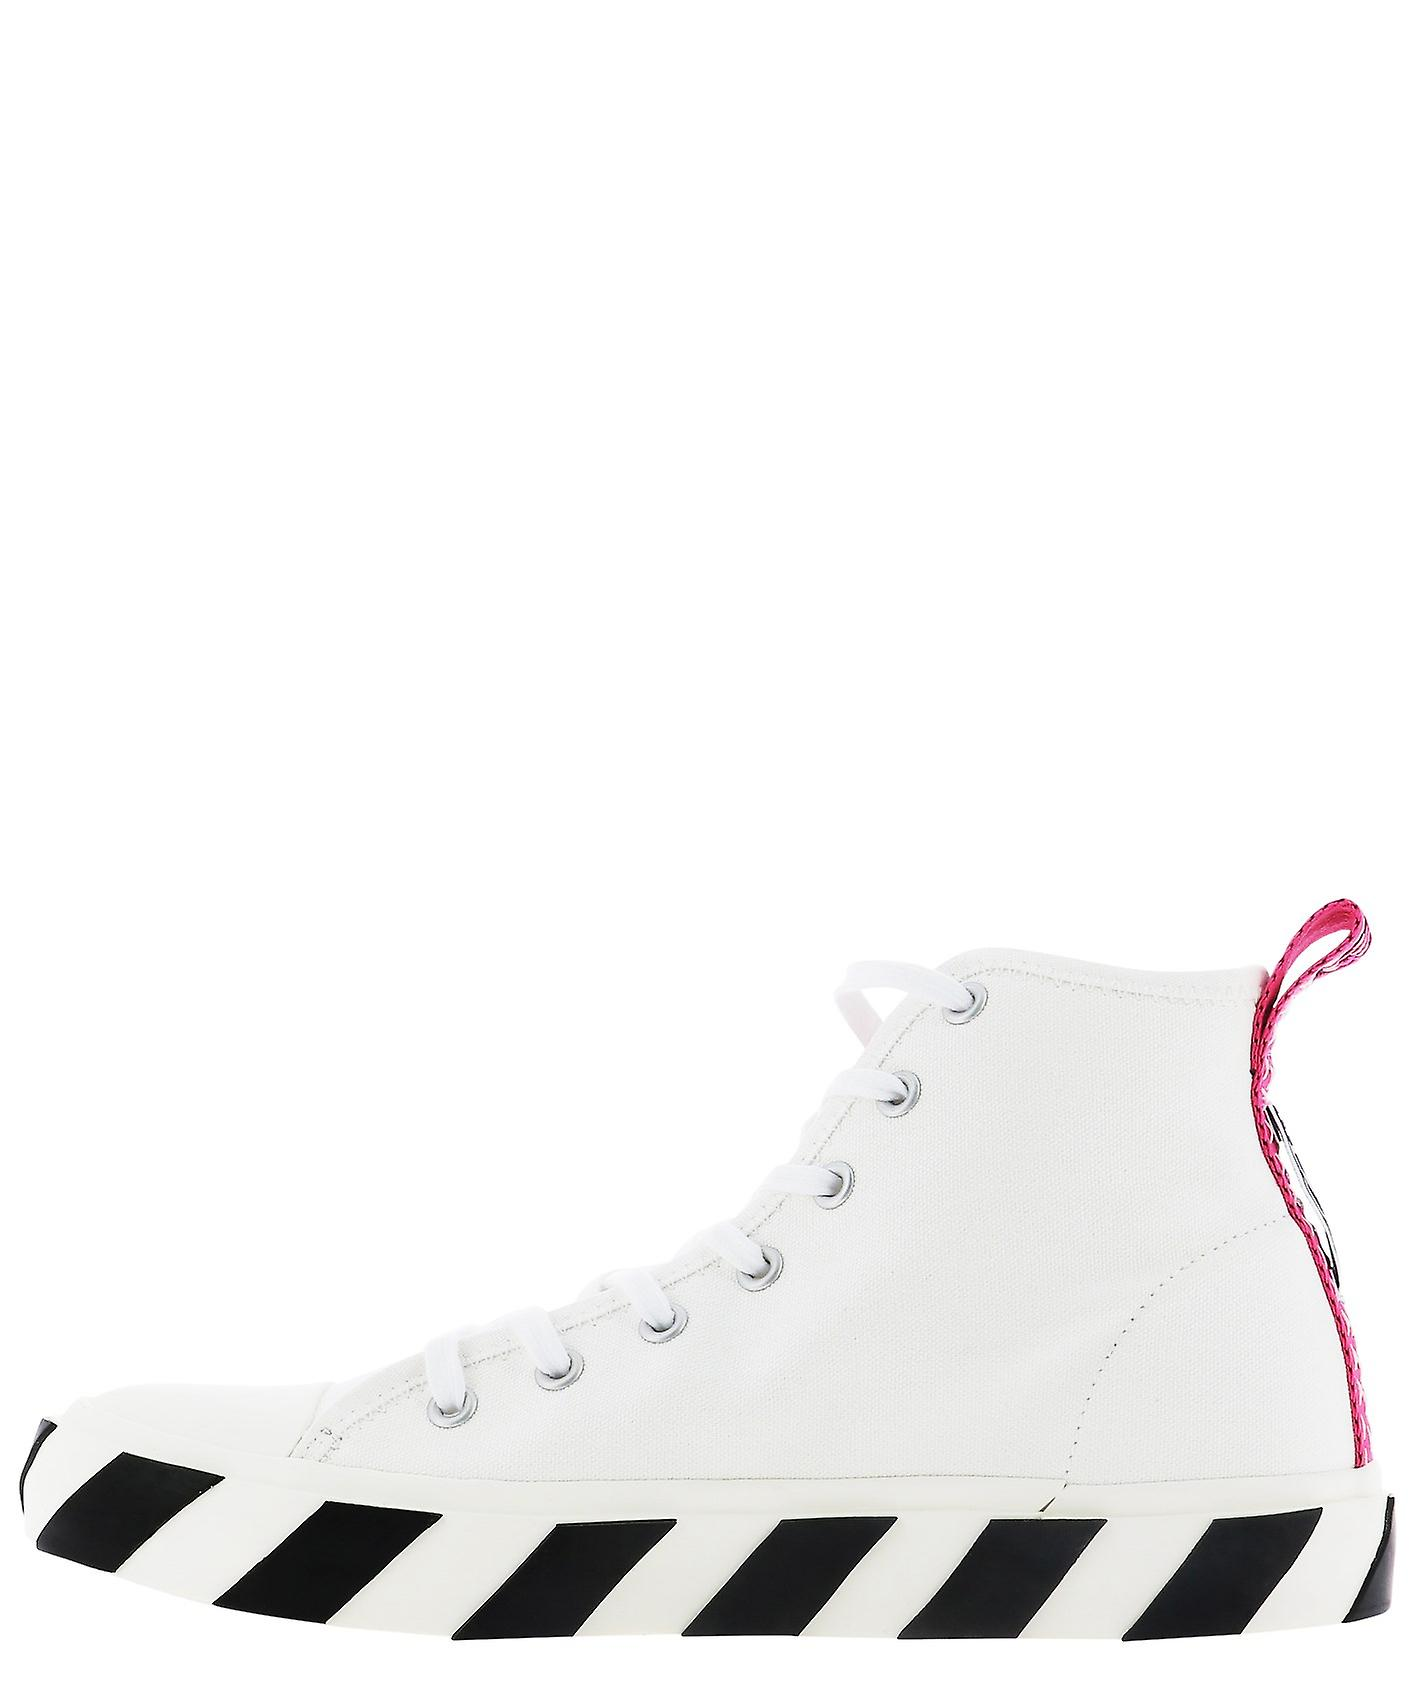 Off-bianco Omia119s20d330380110 Uomini's White Fabric Hi Top Sneakers R5RL5t